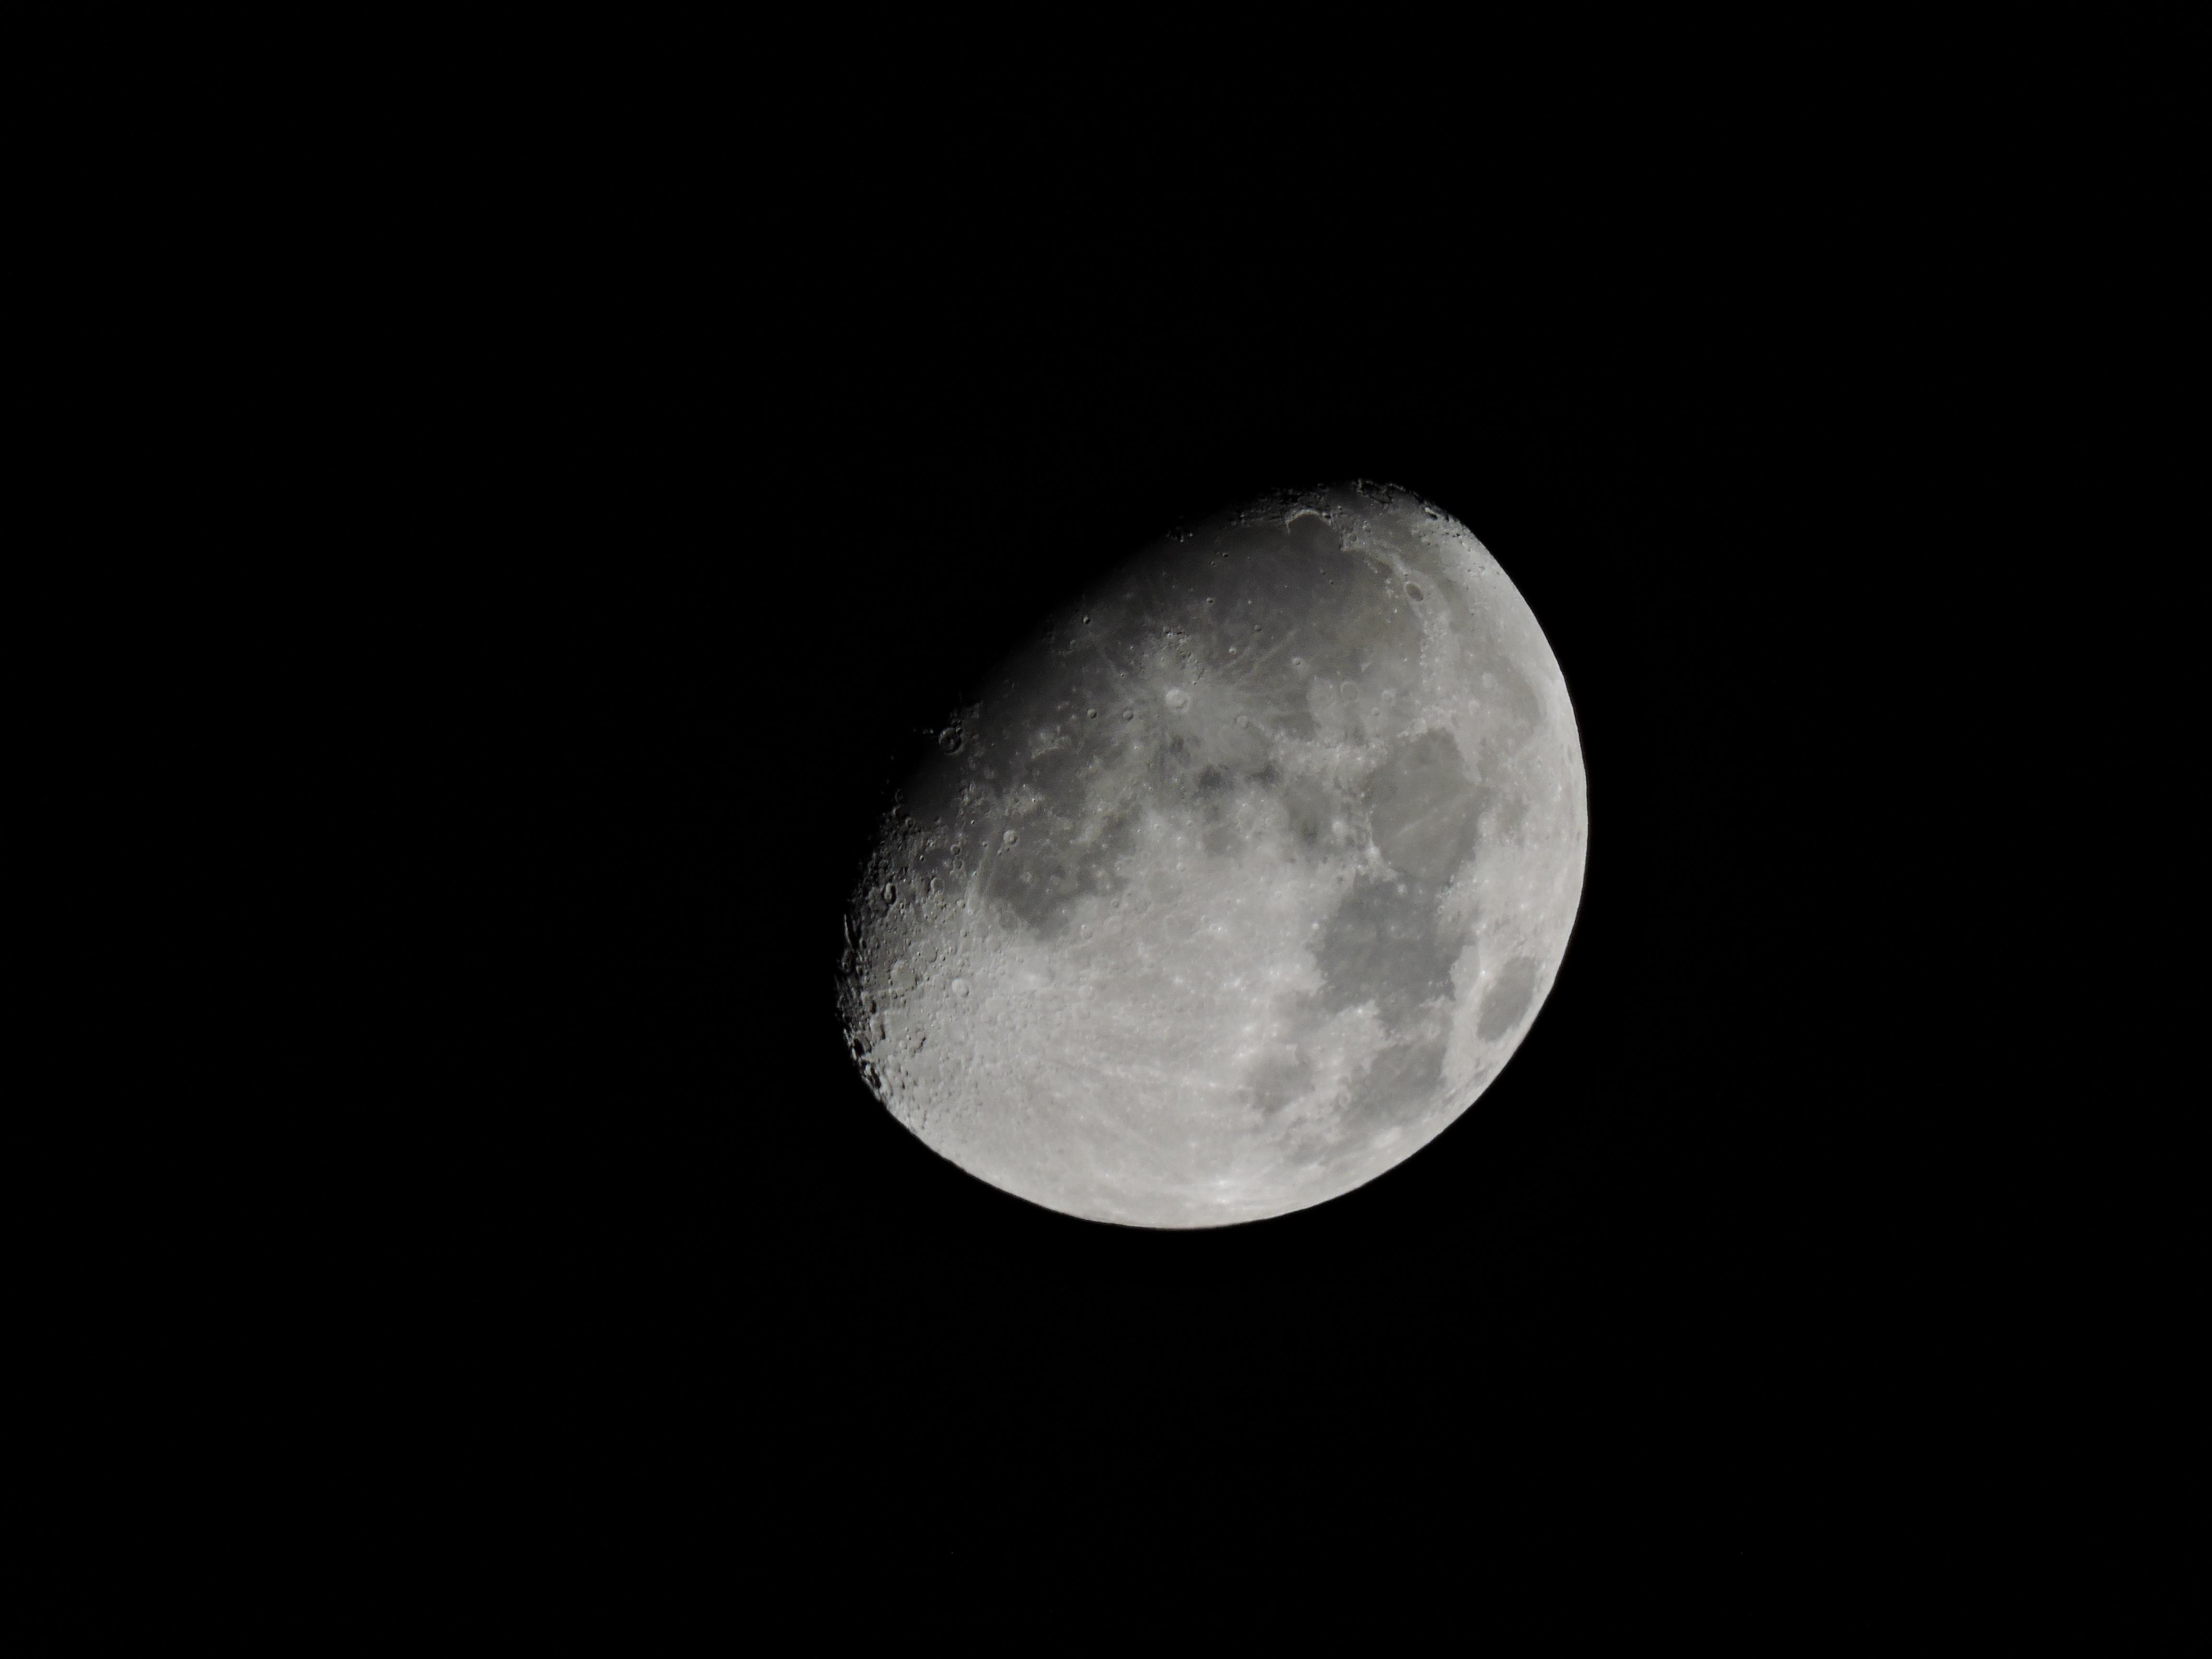 Best Hd Dark Wallpapers Free Stock Photo Of Black And White Dark Moon